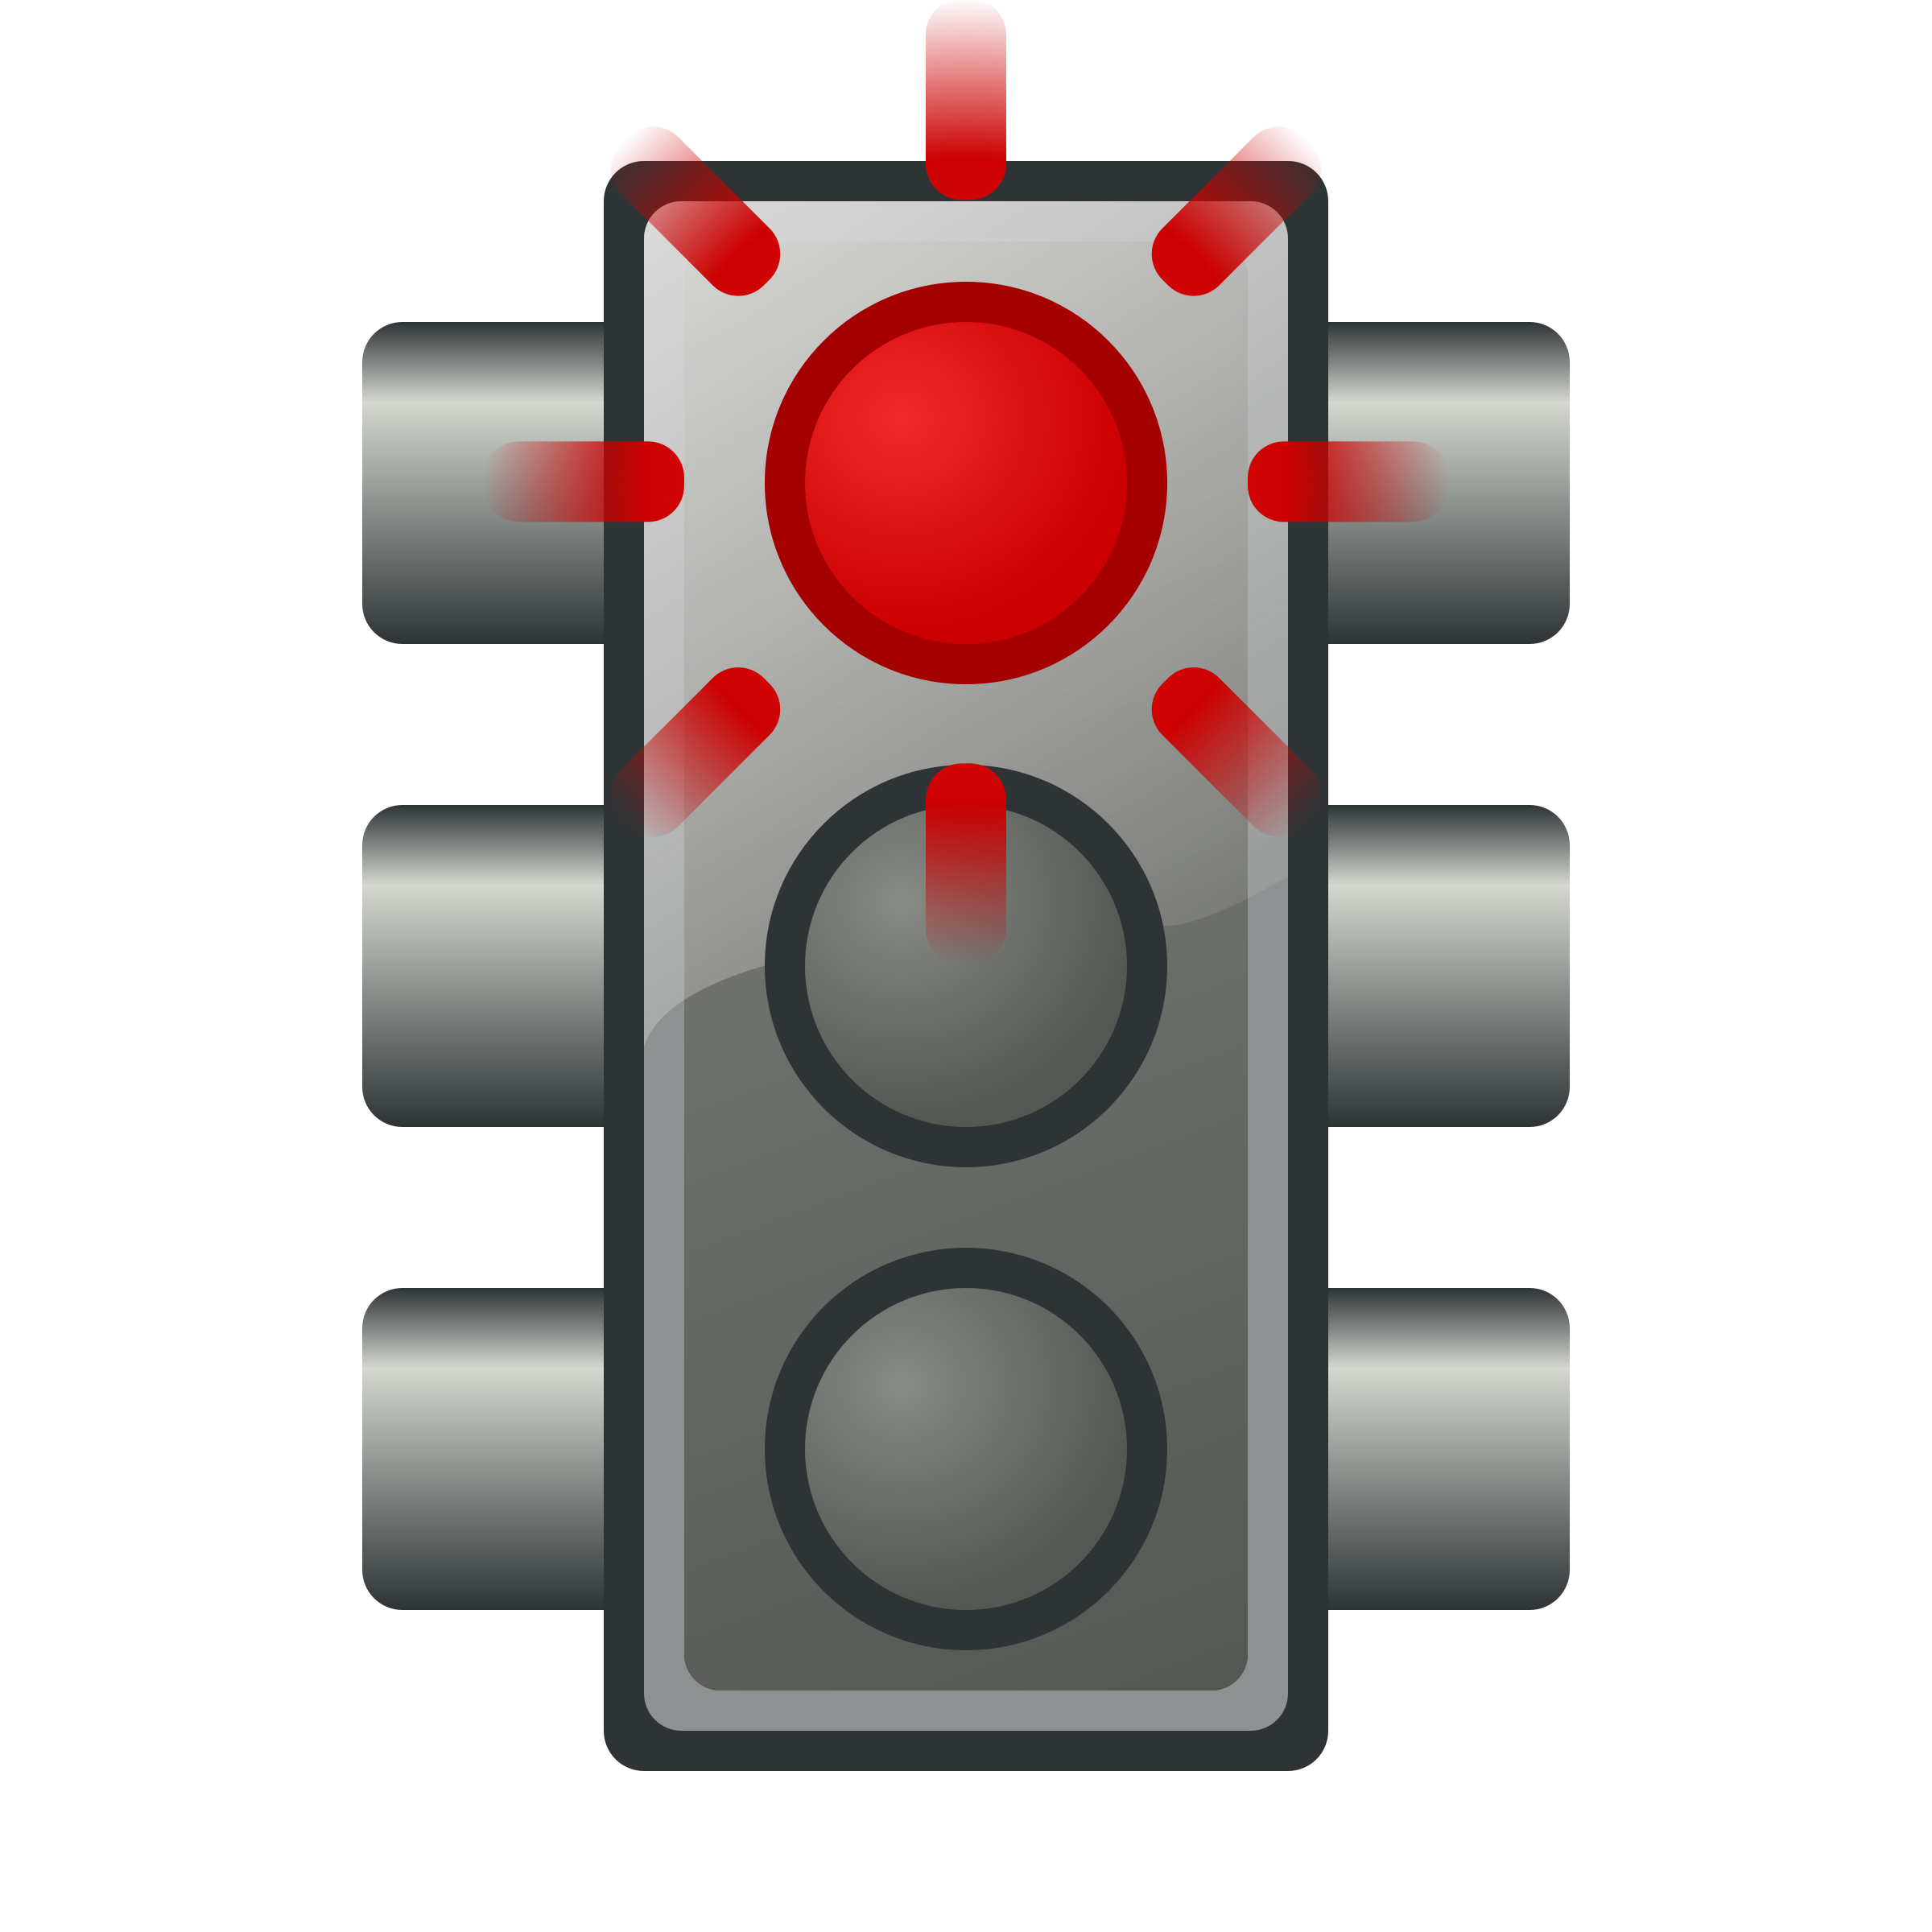 Clipart Flashing Red Light. Flashing red-Clipart Flashing Red Light. Flashing red traffic light-17